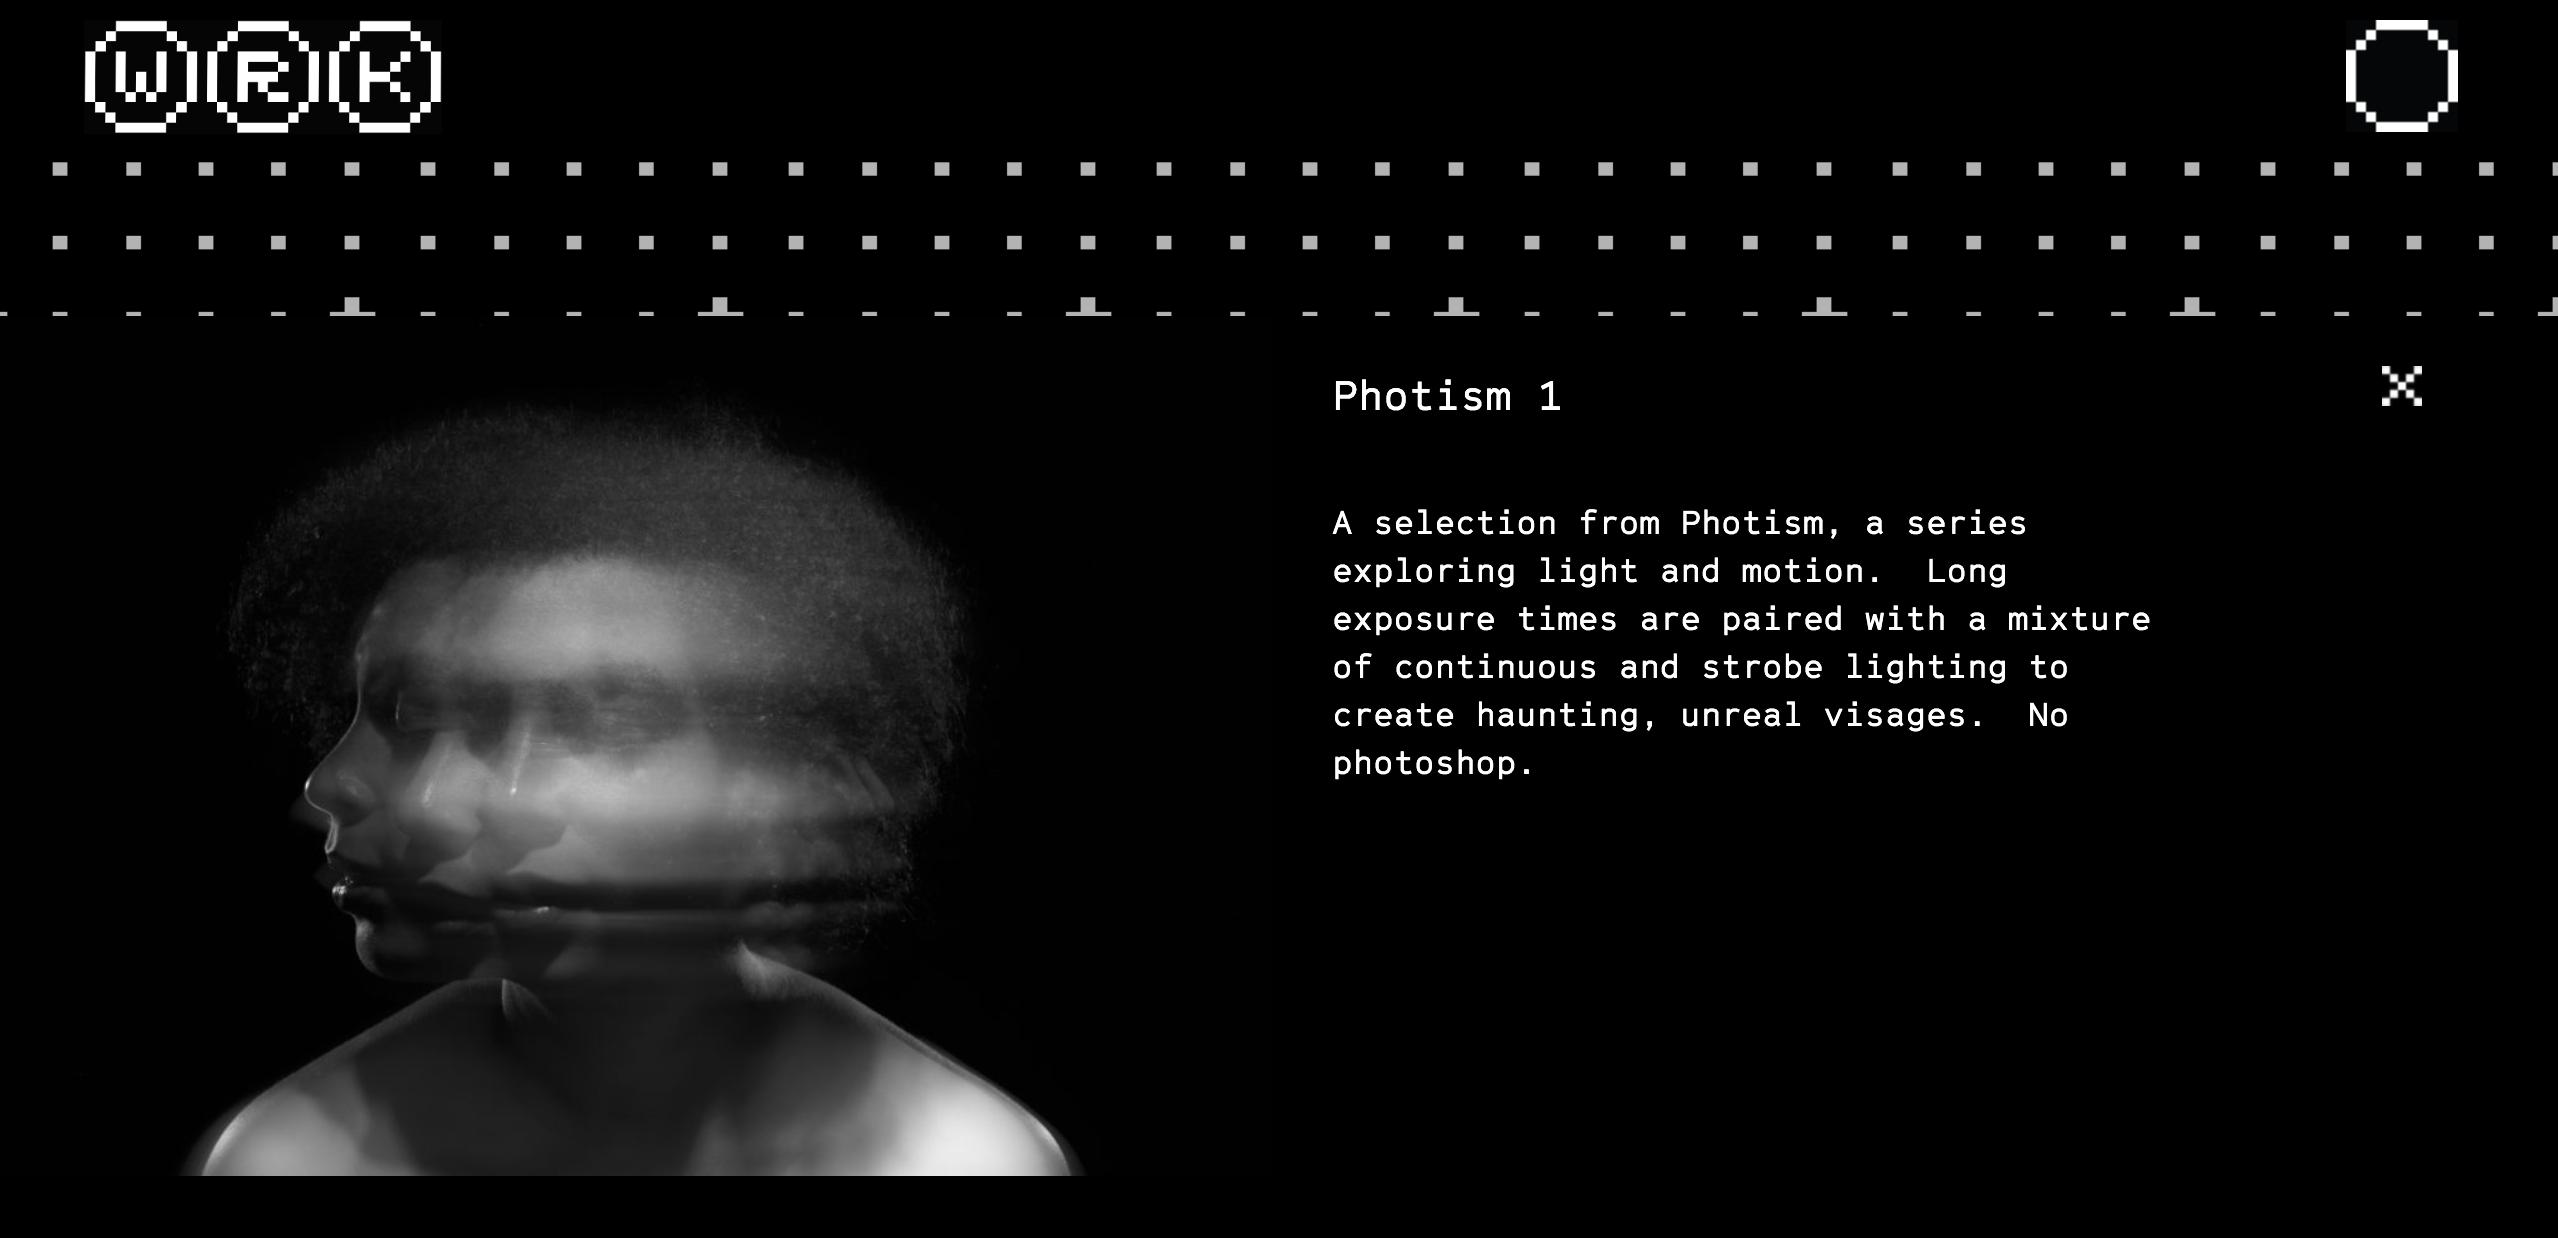 photism